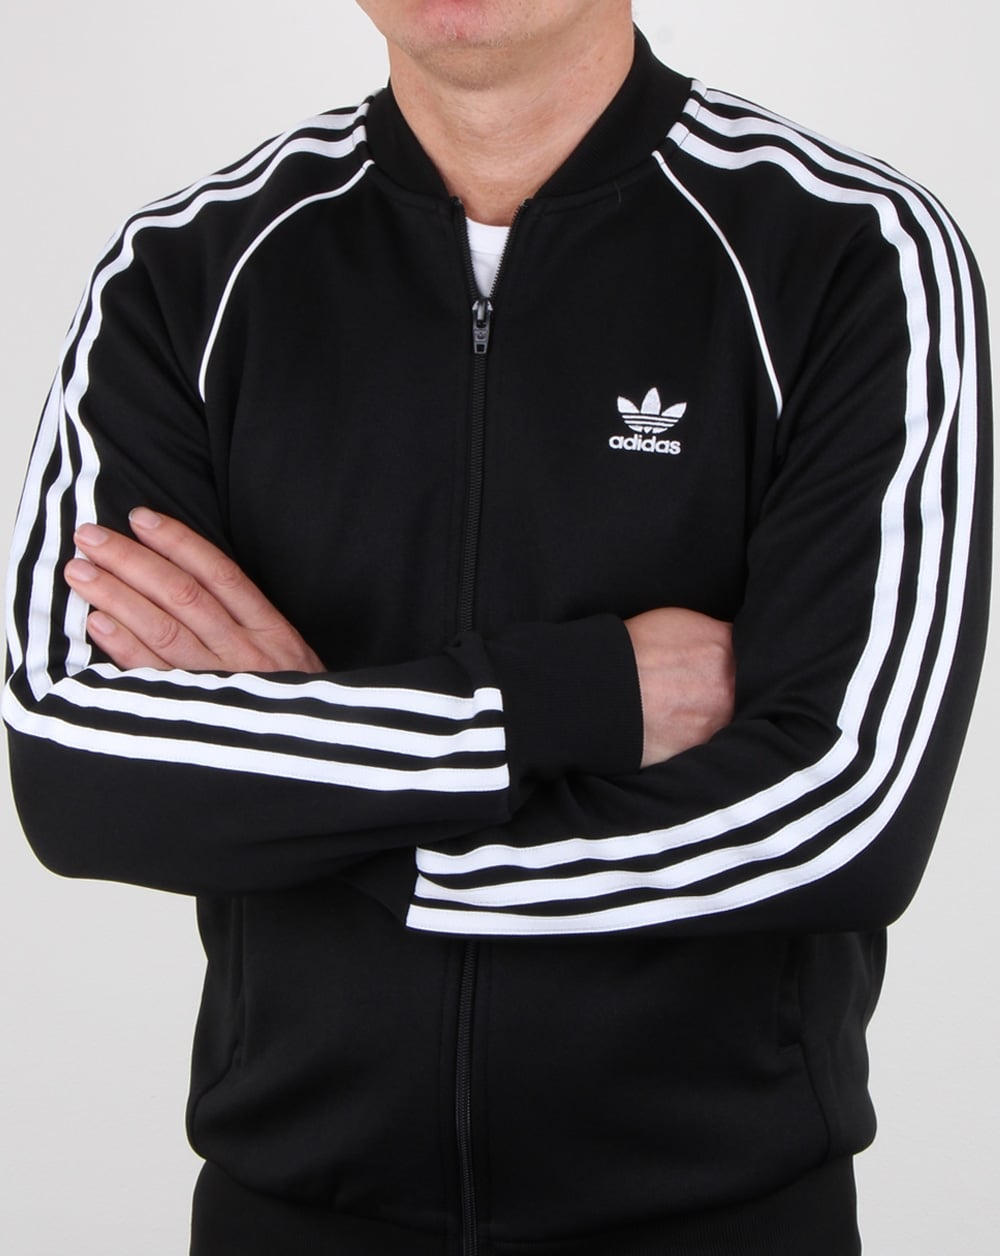 Adidas Originals Superstar Pista Top Nero mWDAl